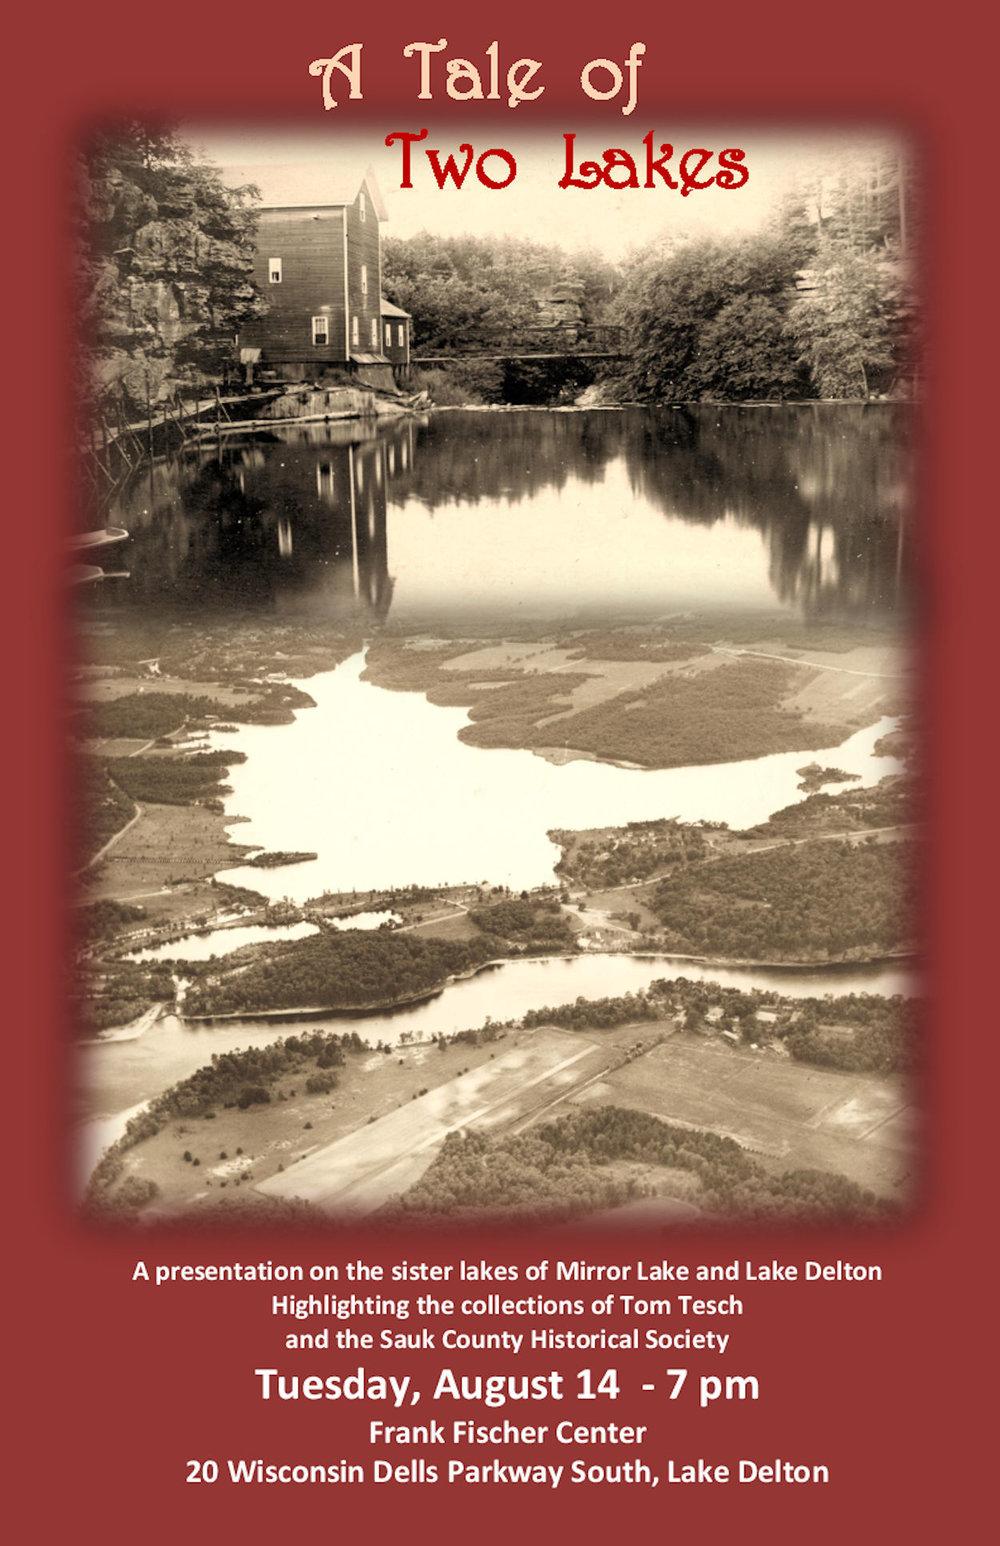 Two Lakes Talk poster2.jpg